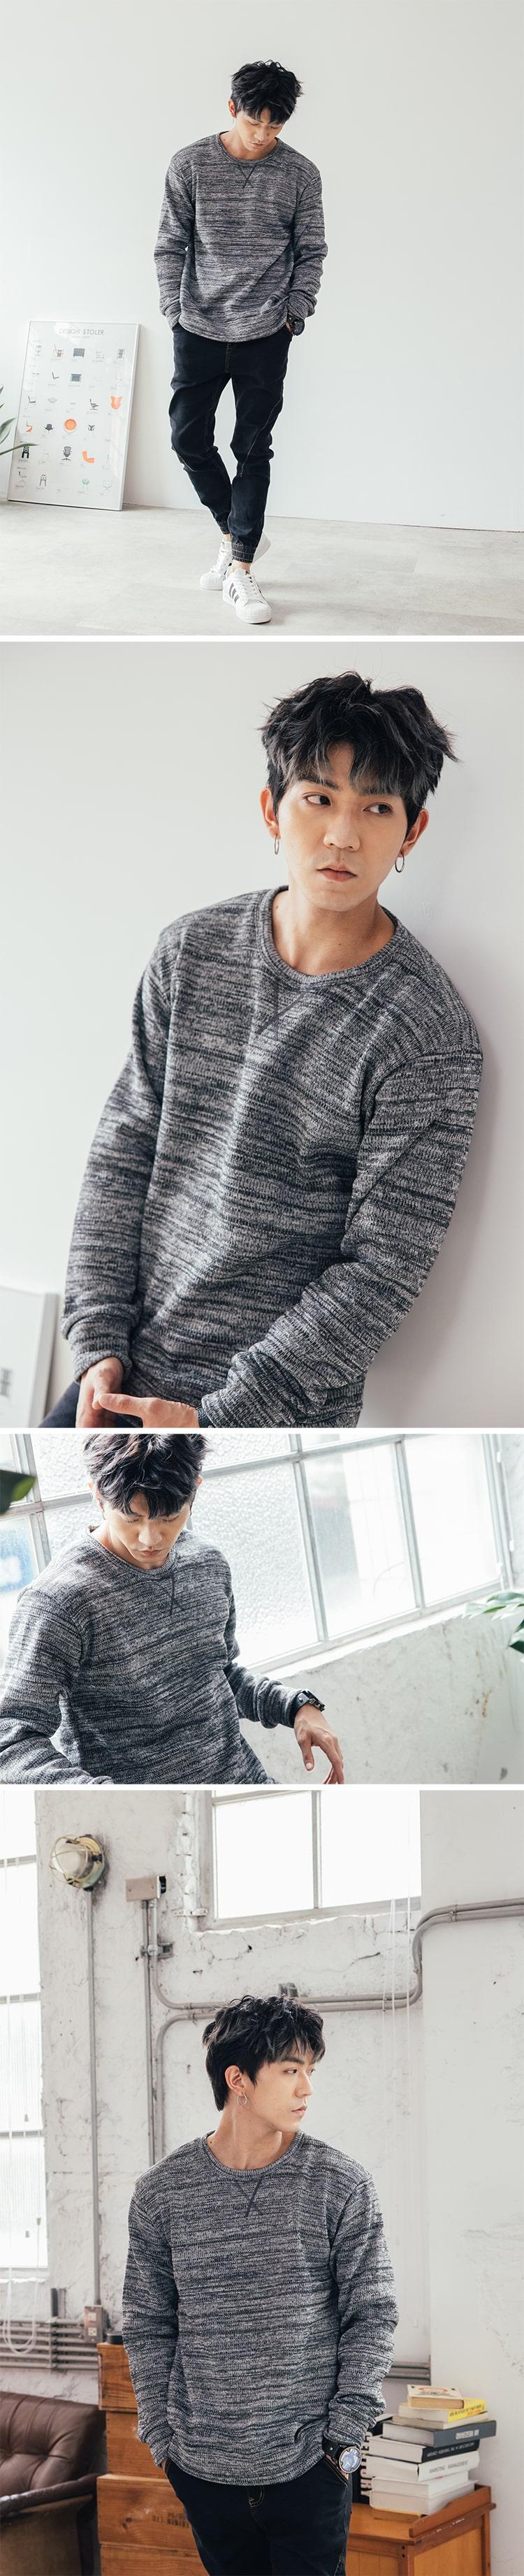 MIT.混色領下X縫線.彈性圓領針織毛衣.有大碼